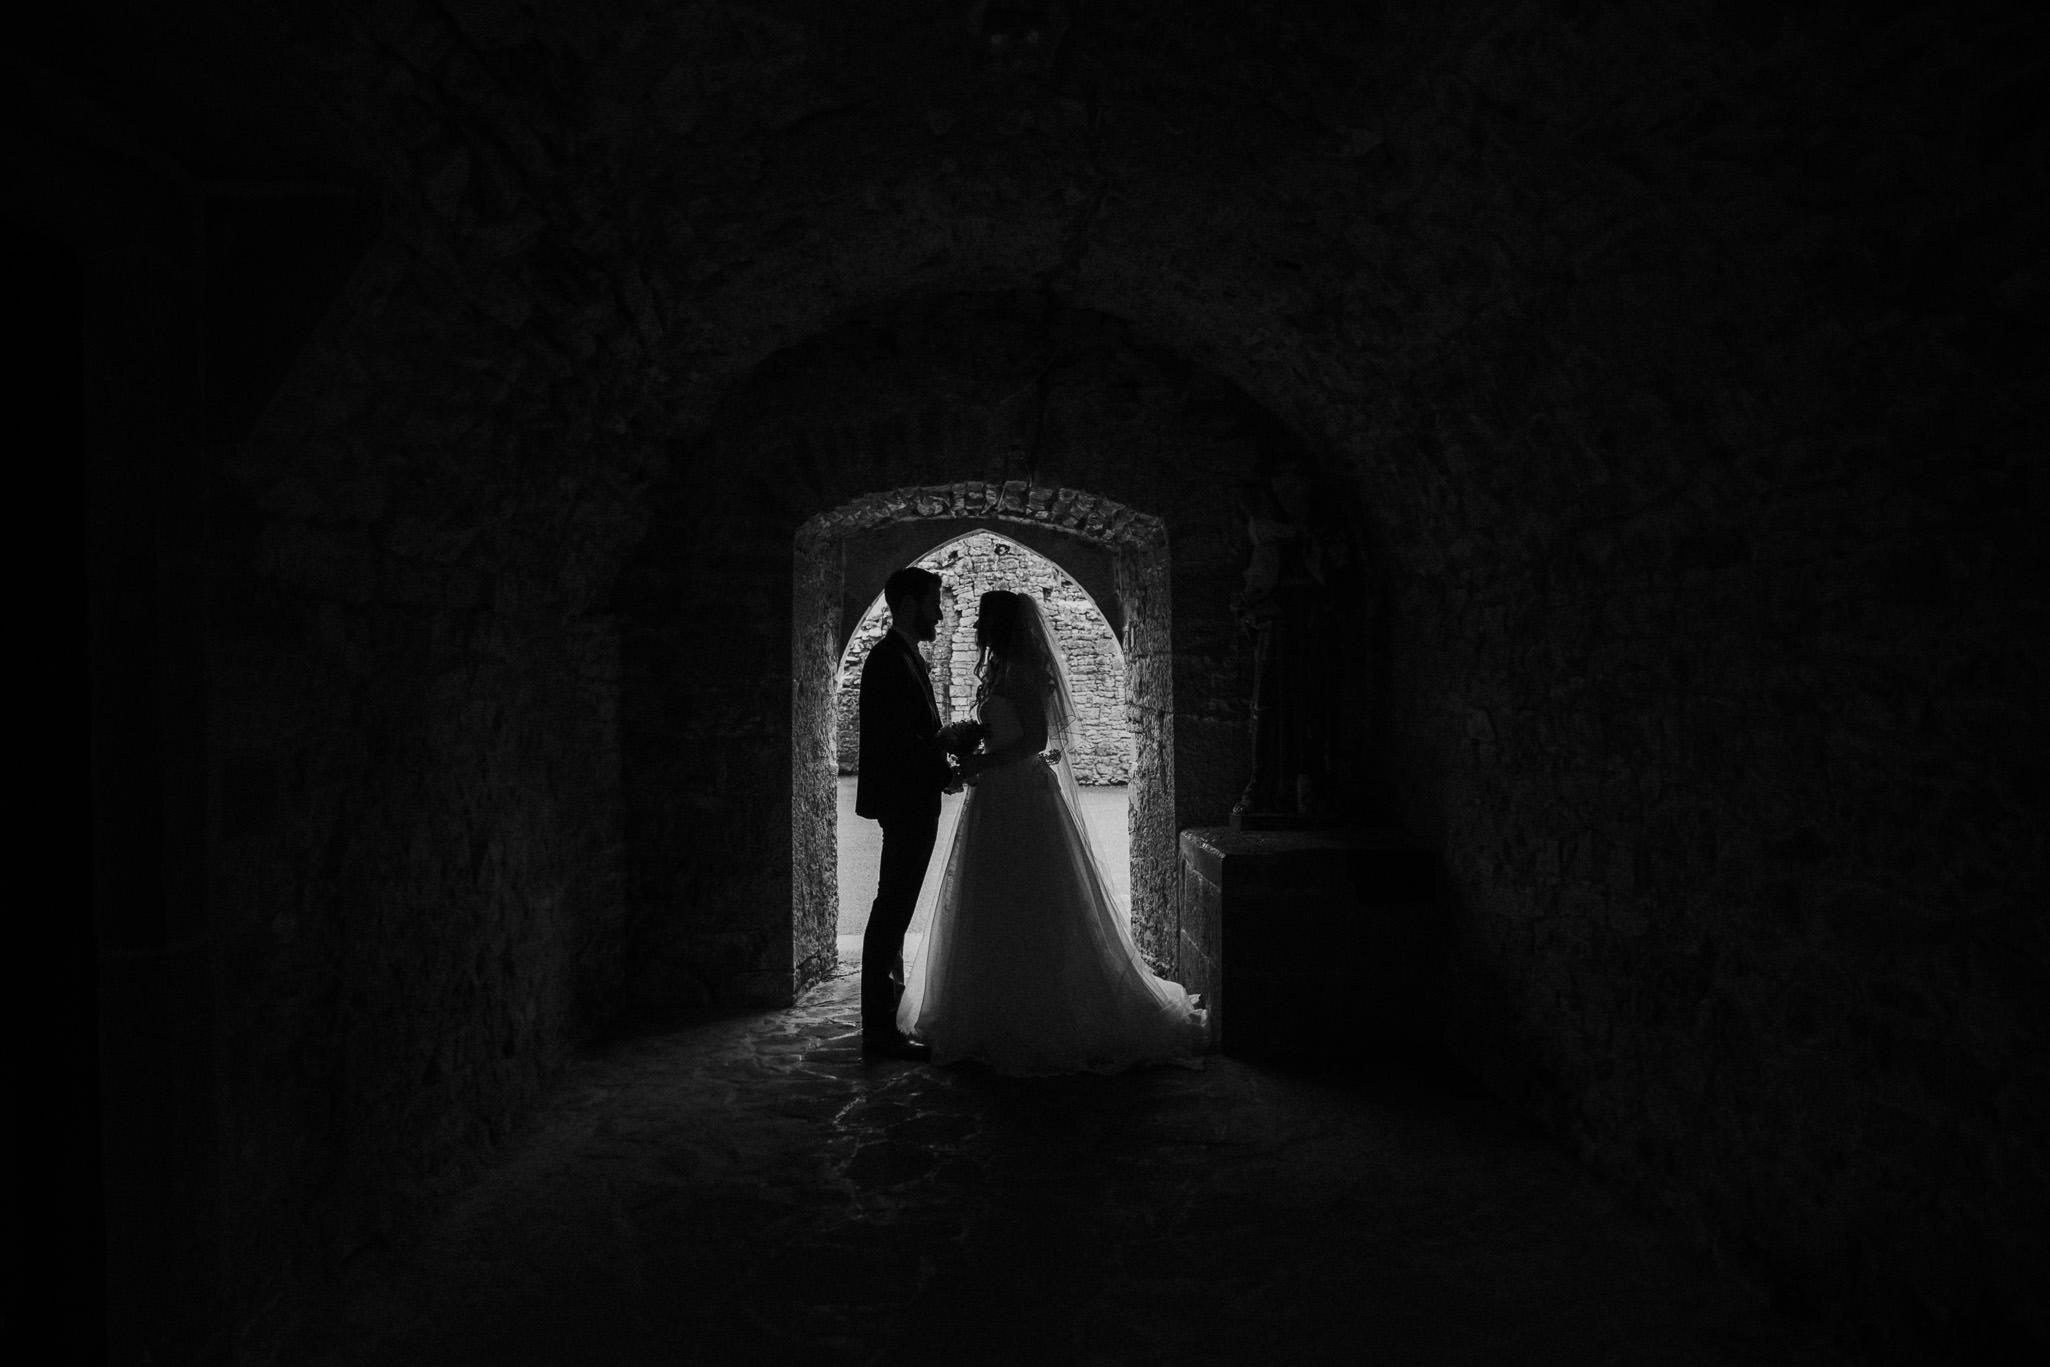 clairebyrnephotography-wedding-night-sparklers-new-years-eve-denyce-leonard-15.jpg